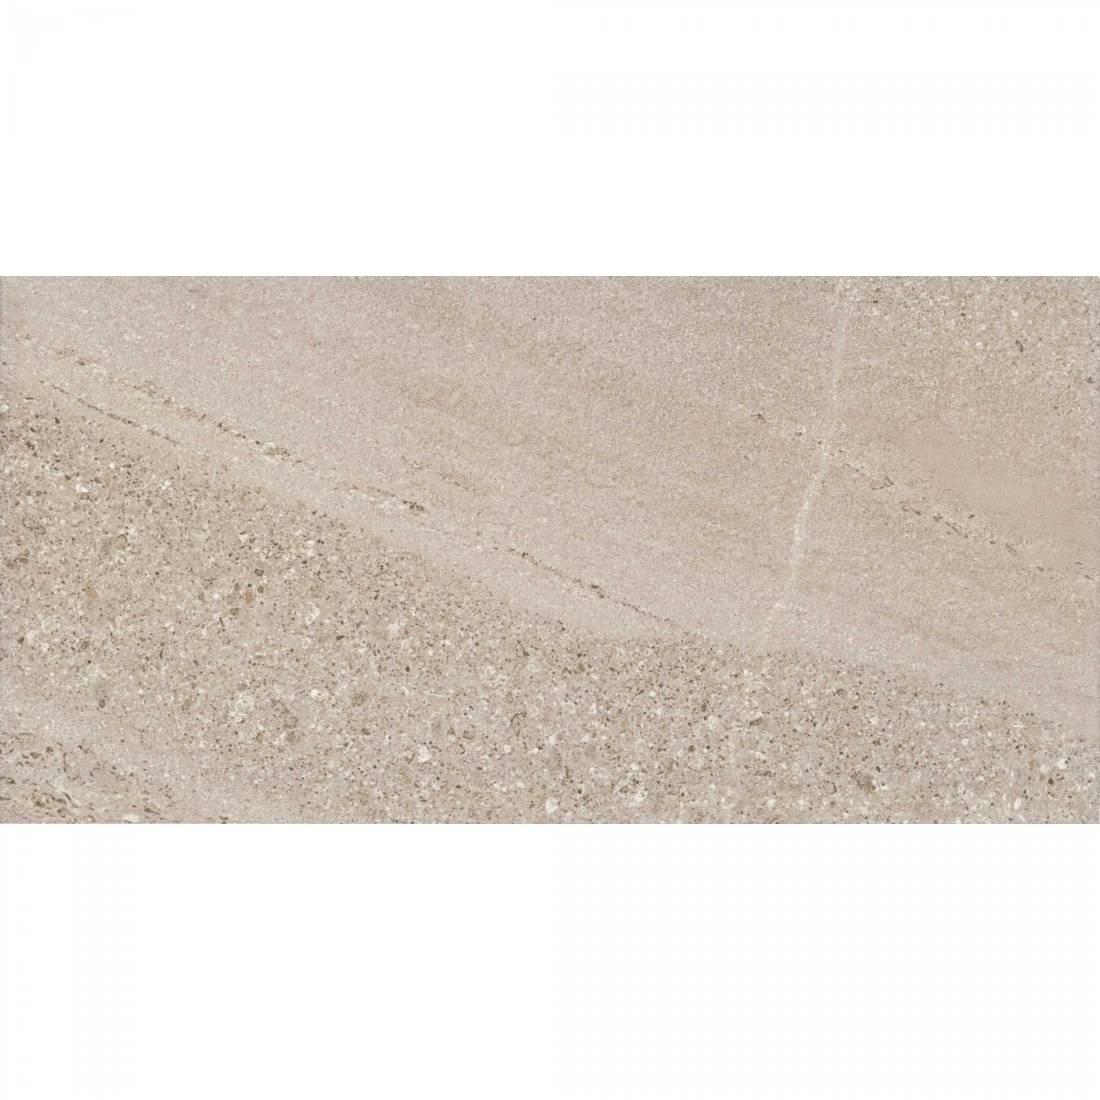 Balance 30x60 Sand Matt 1